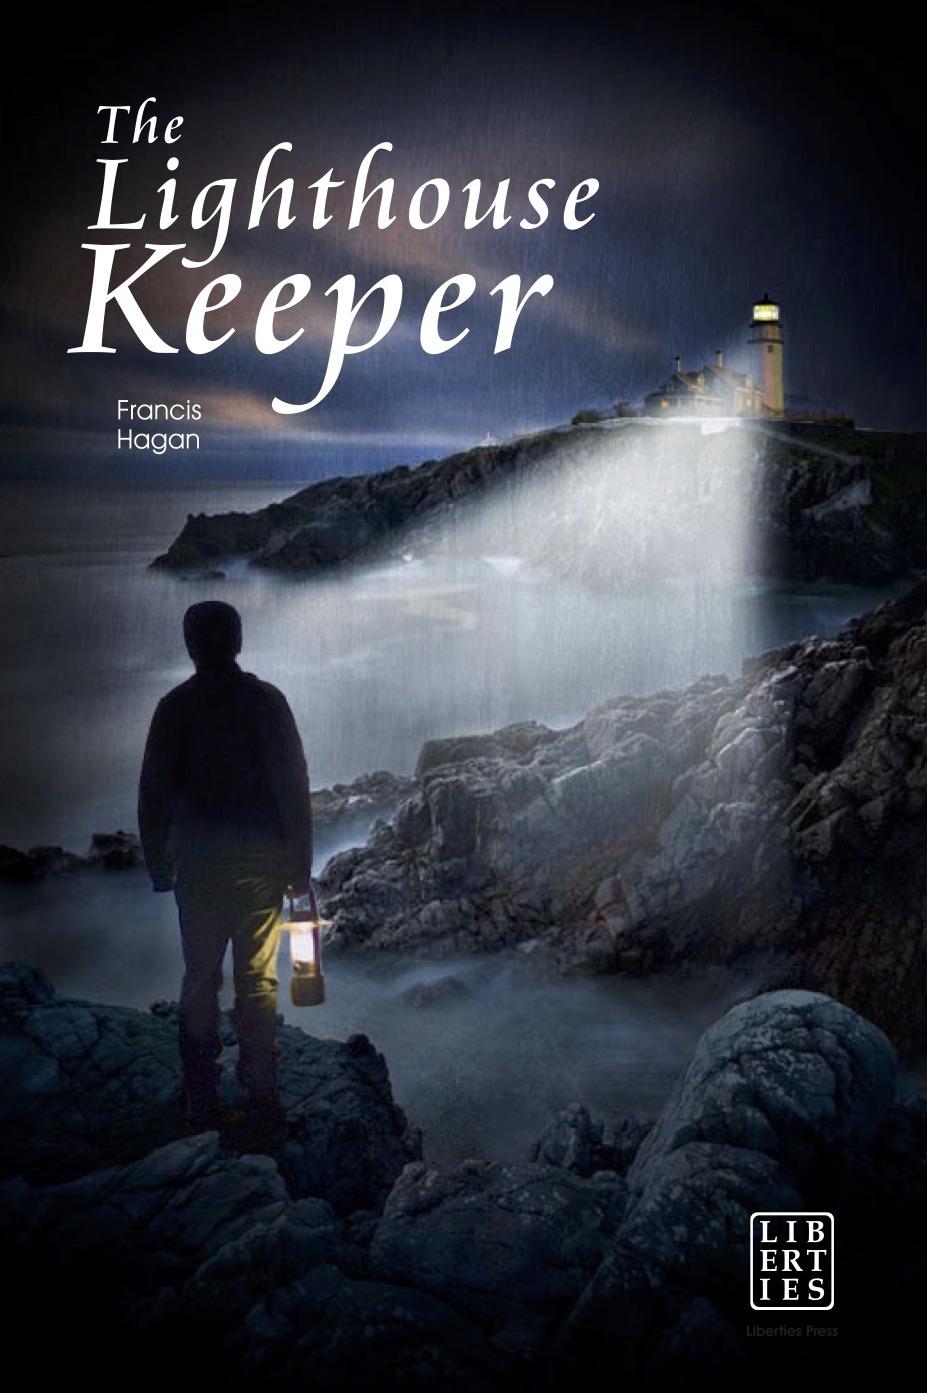 LighthouseKeeper front jacket.jpg